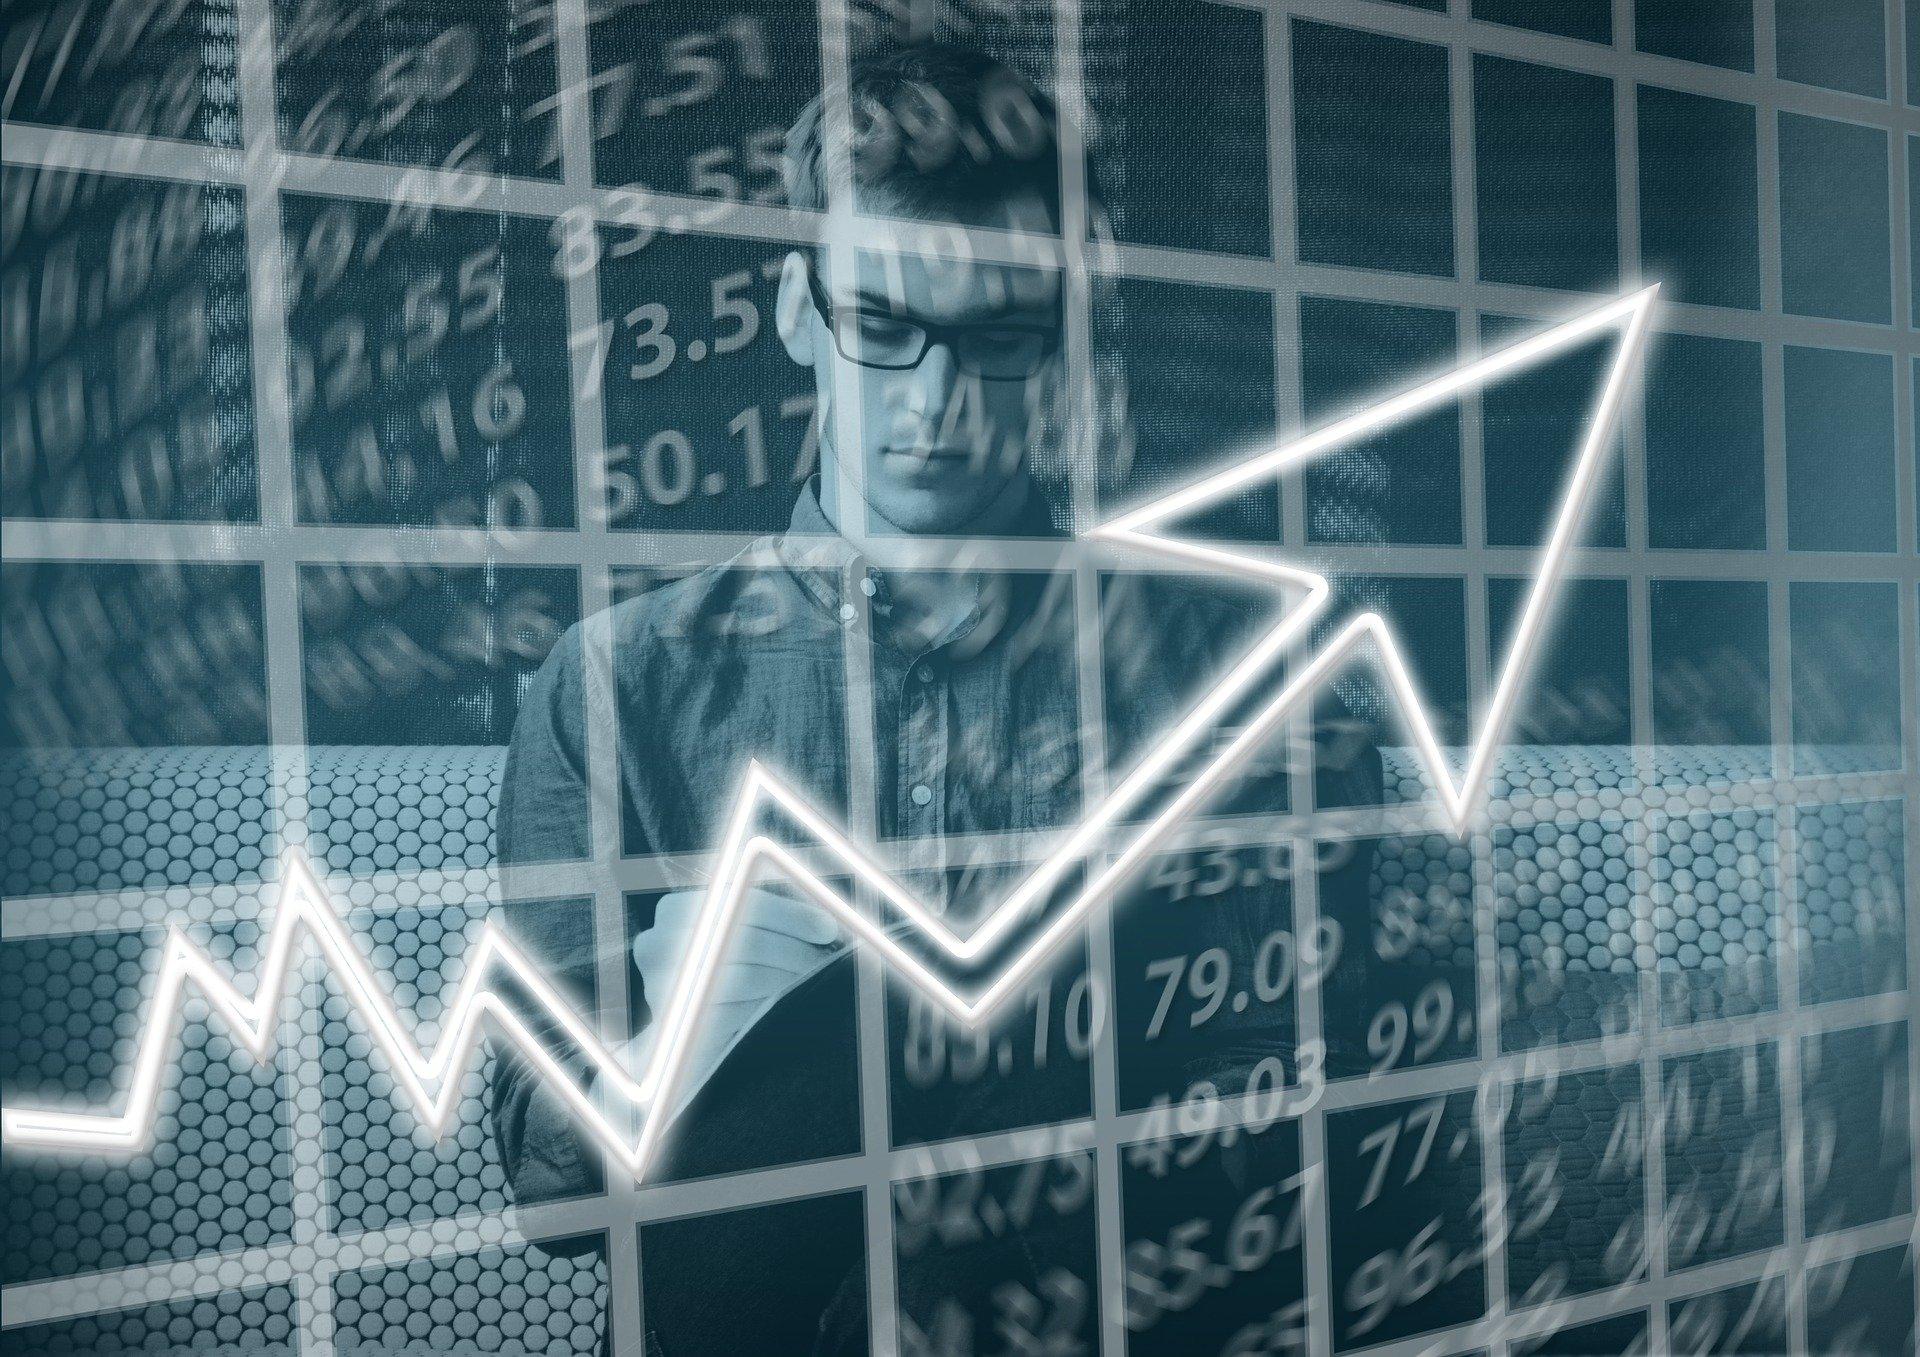 [WEEKLY RASSI] 콤비네이션(CO) +74% 실현 - 1월 5째주 라씨 AI 매매성과